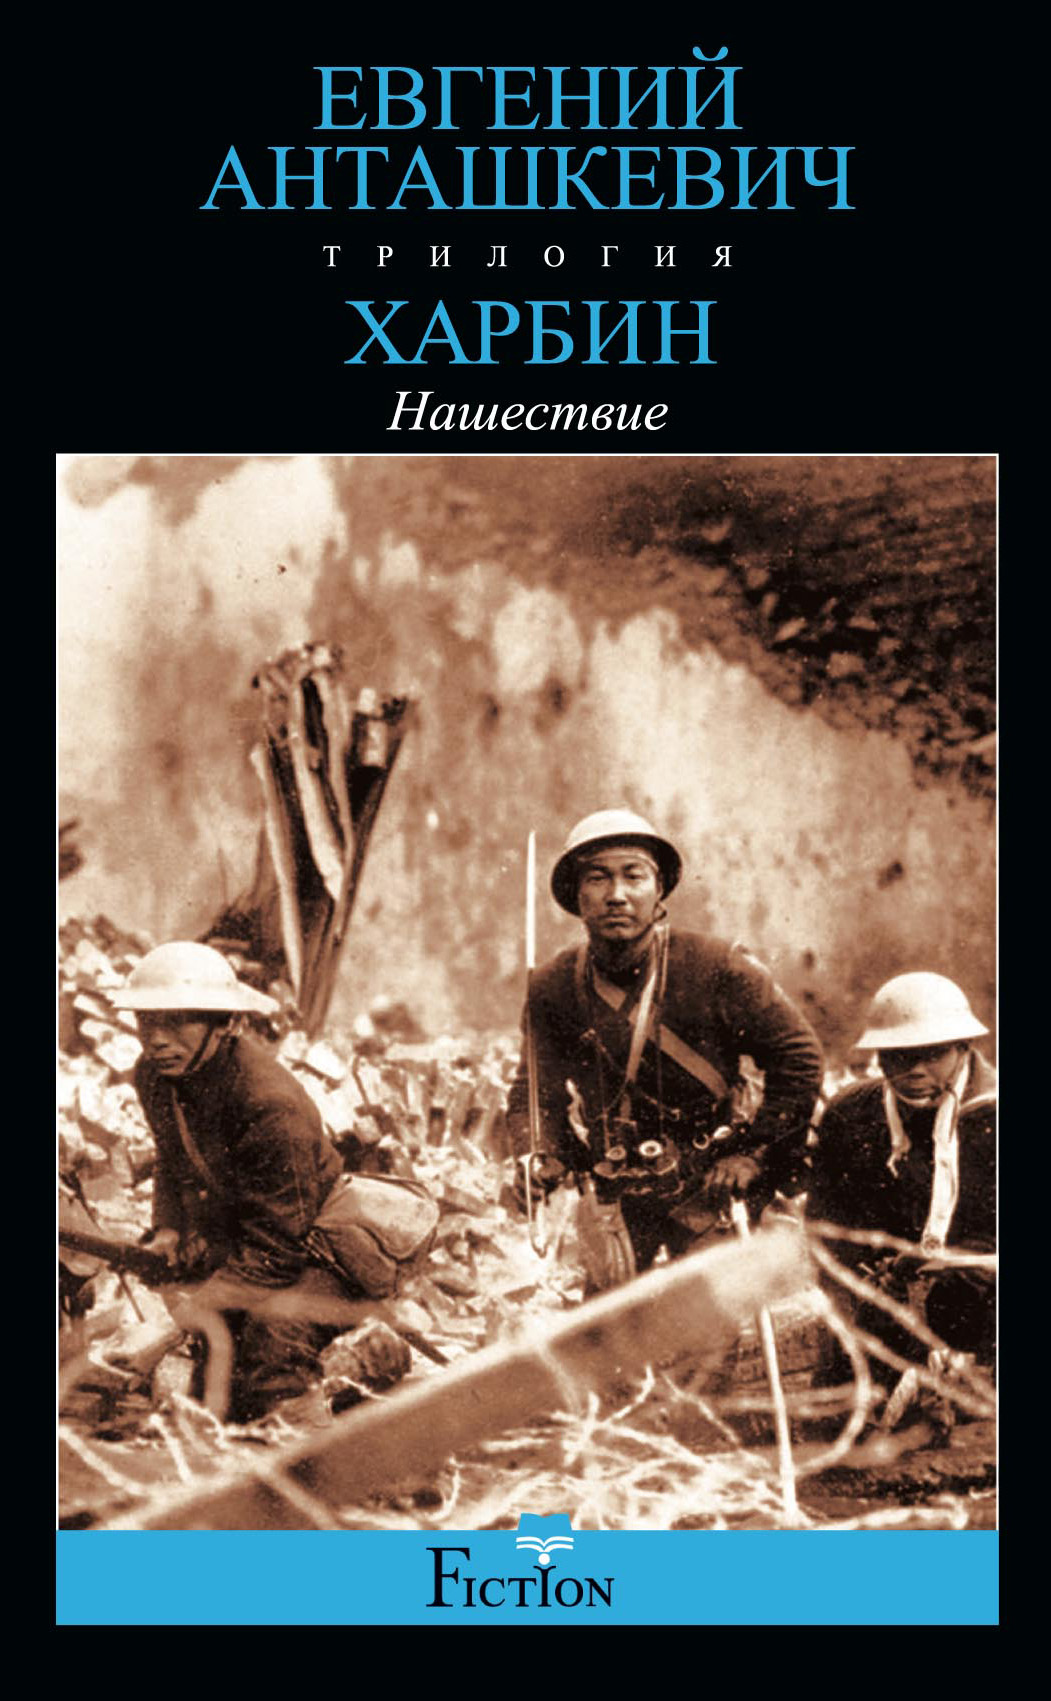 Евгений Анташкевич «Харбин. Книга 2. Нашествие»